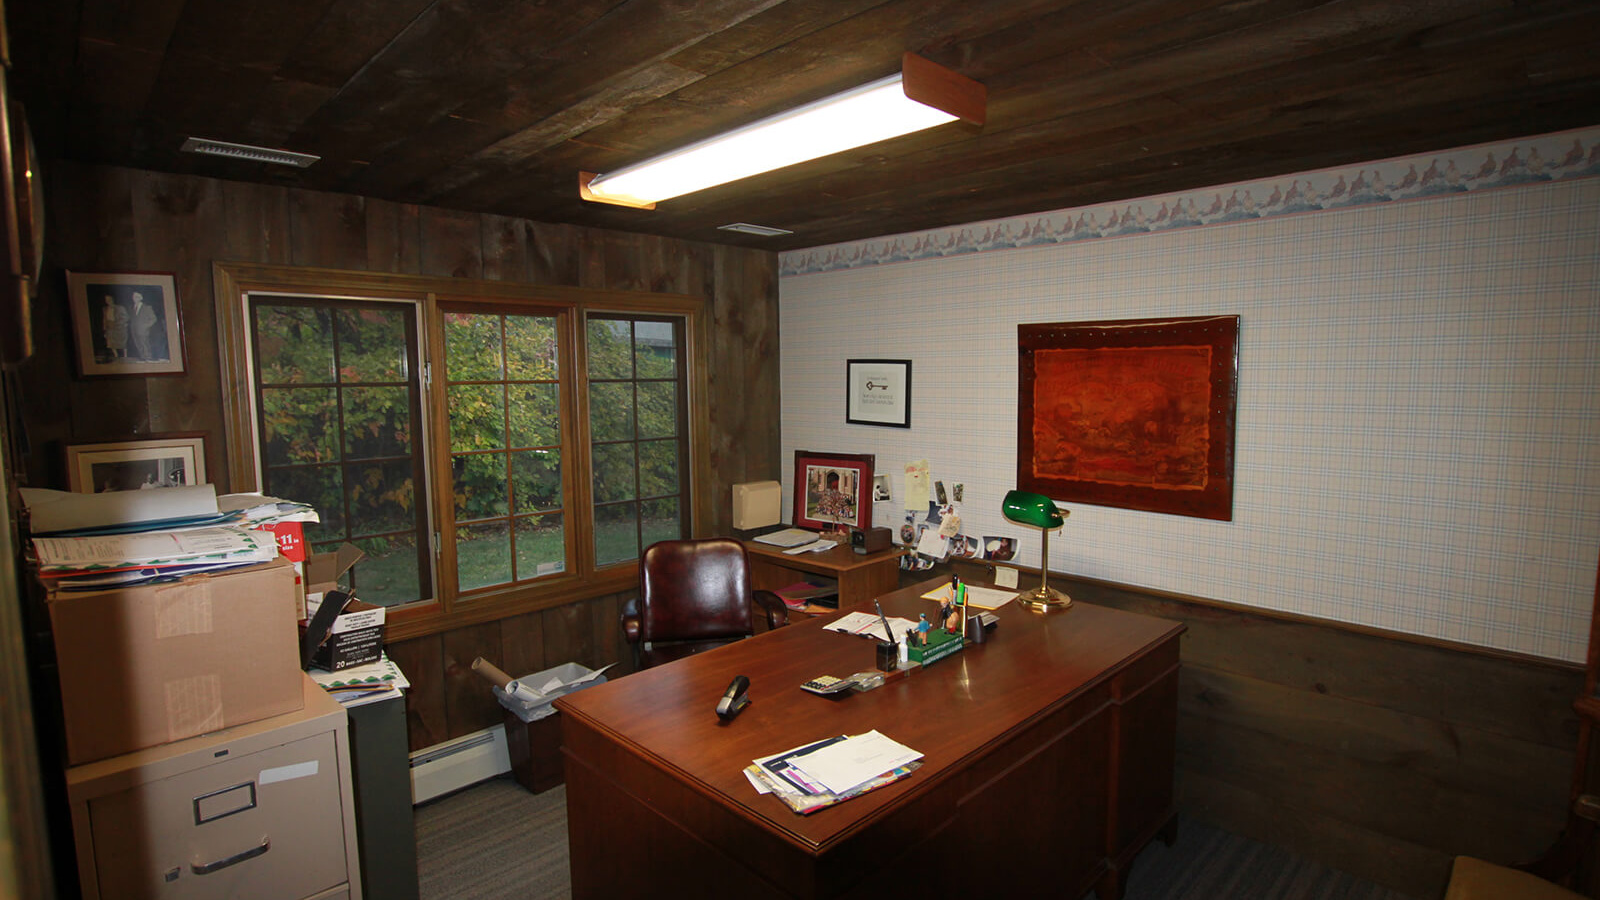 101 Auburn Street, Auburn, Massachusetts 01501, Office,For Sale,Auburn Street,1296